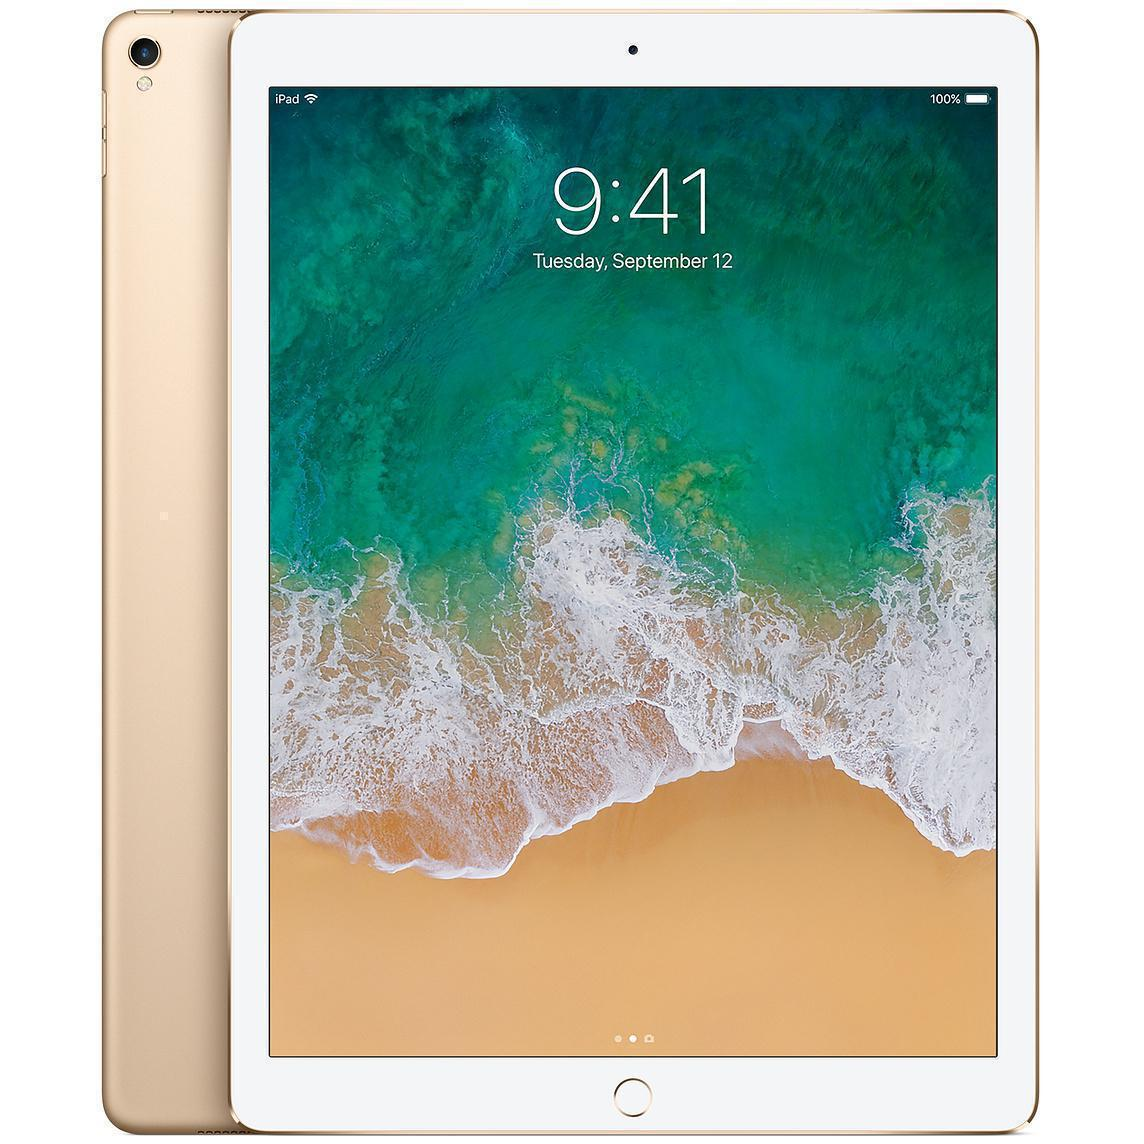 iPad Pro 12.9-Inch 2nd Gen (2017) - Wi-Fi + GSM/CDMA + LTE